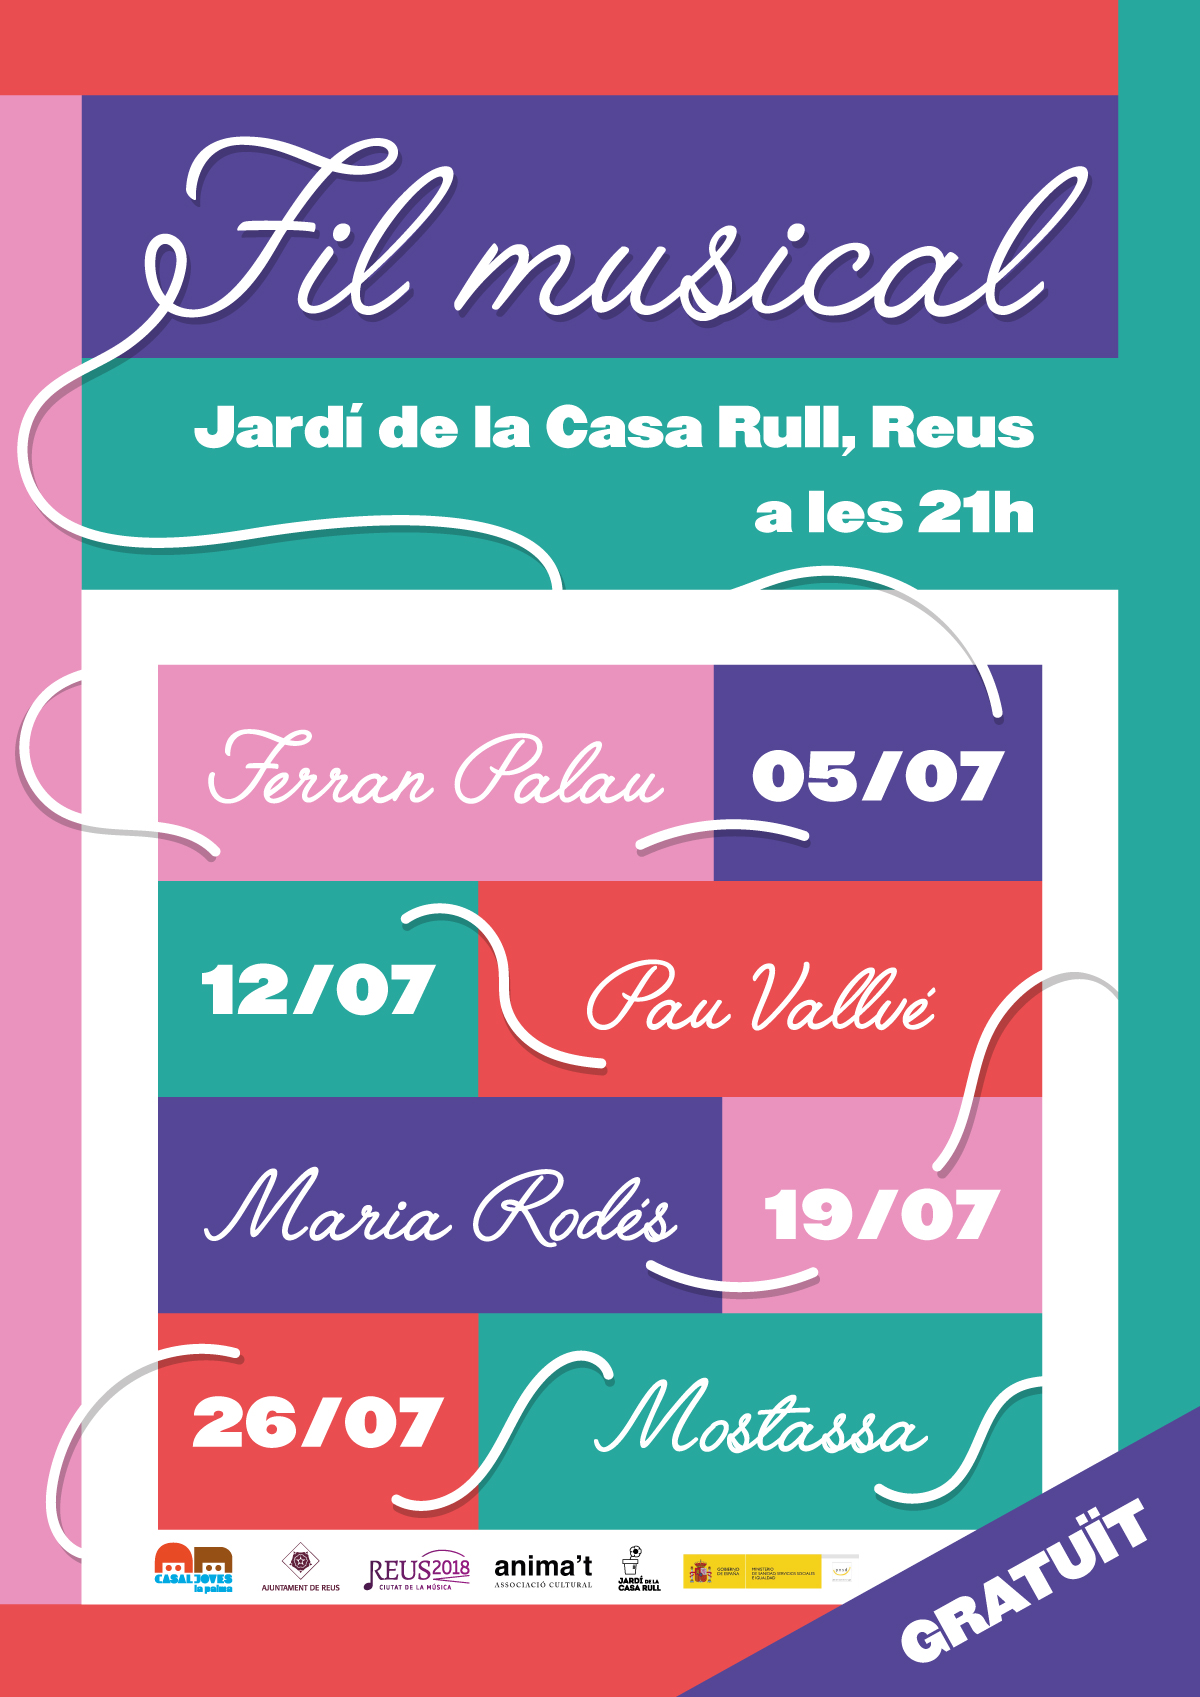 Fil musical - Mostassa